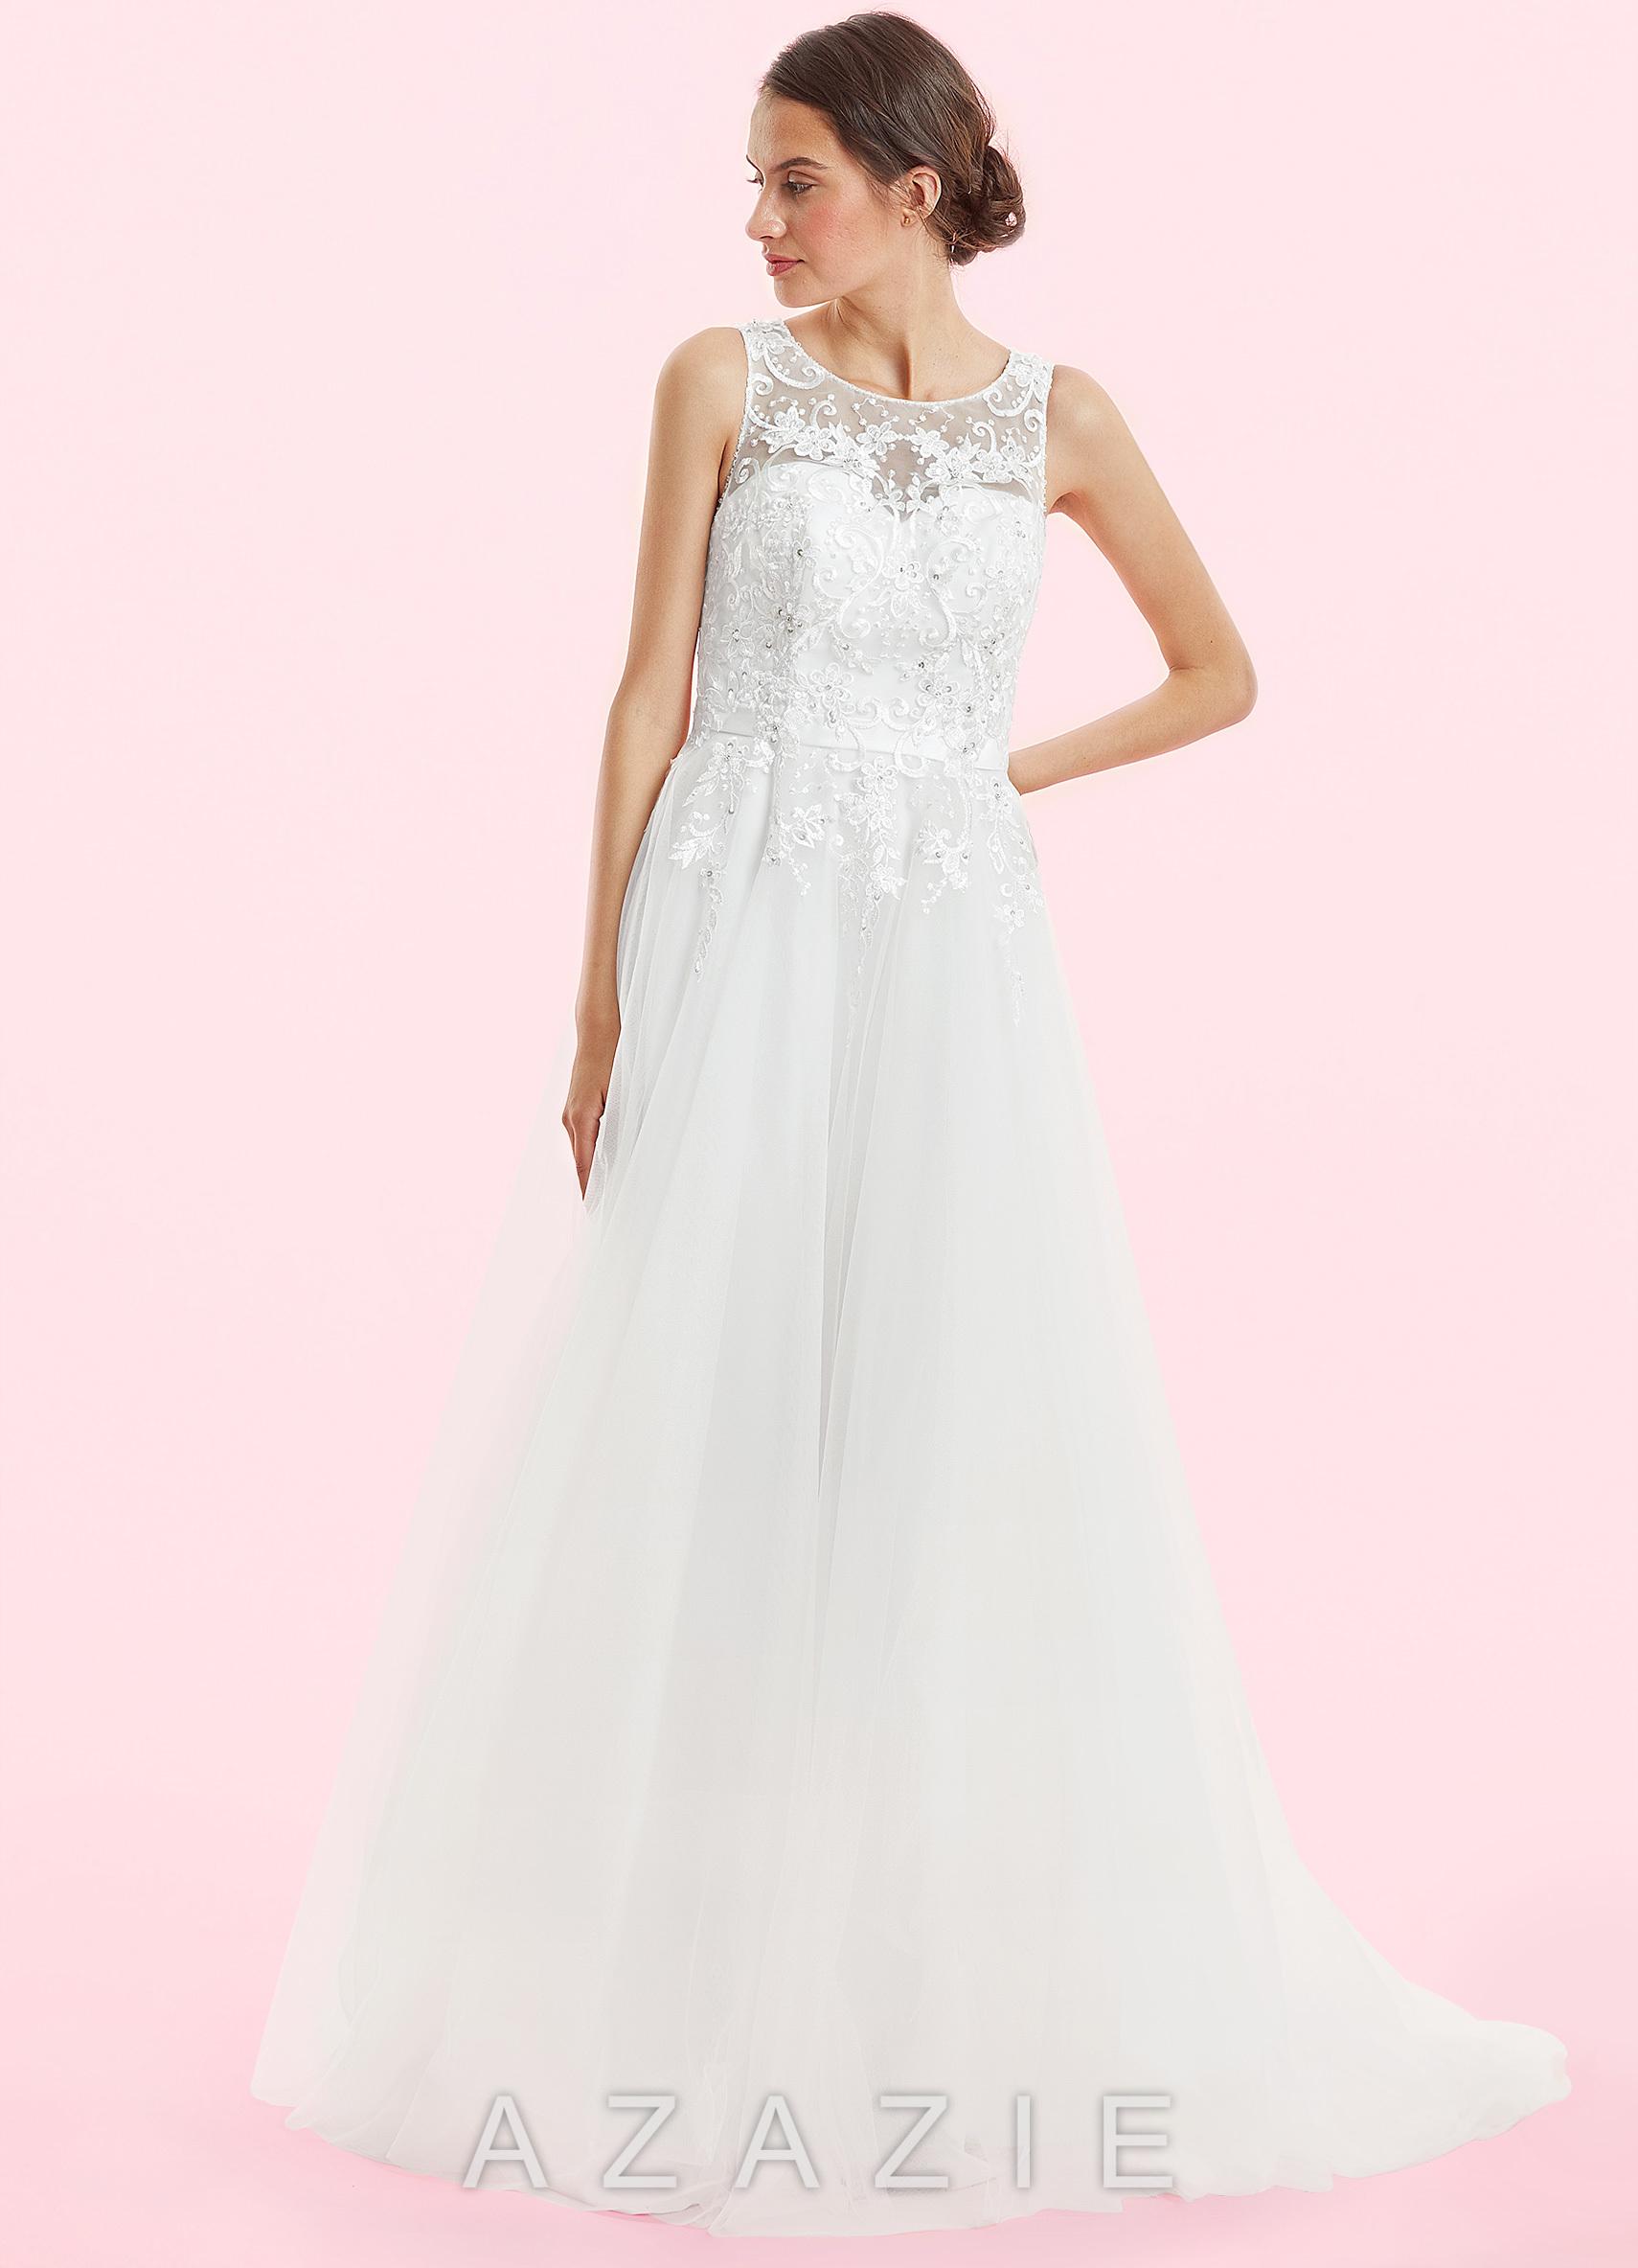 Home Wedding Dresses Azazie Paisley BG Loading Zoom